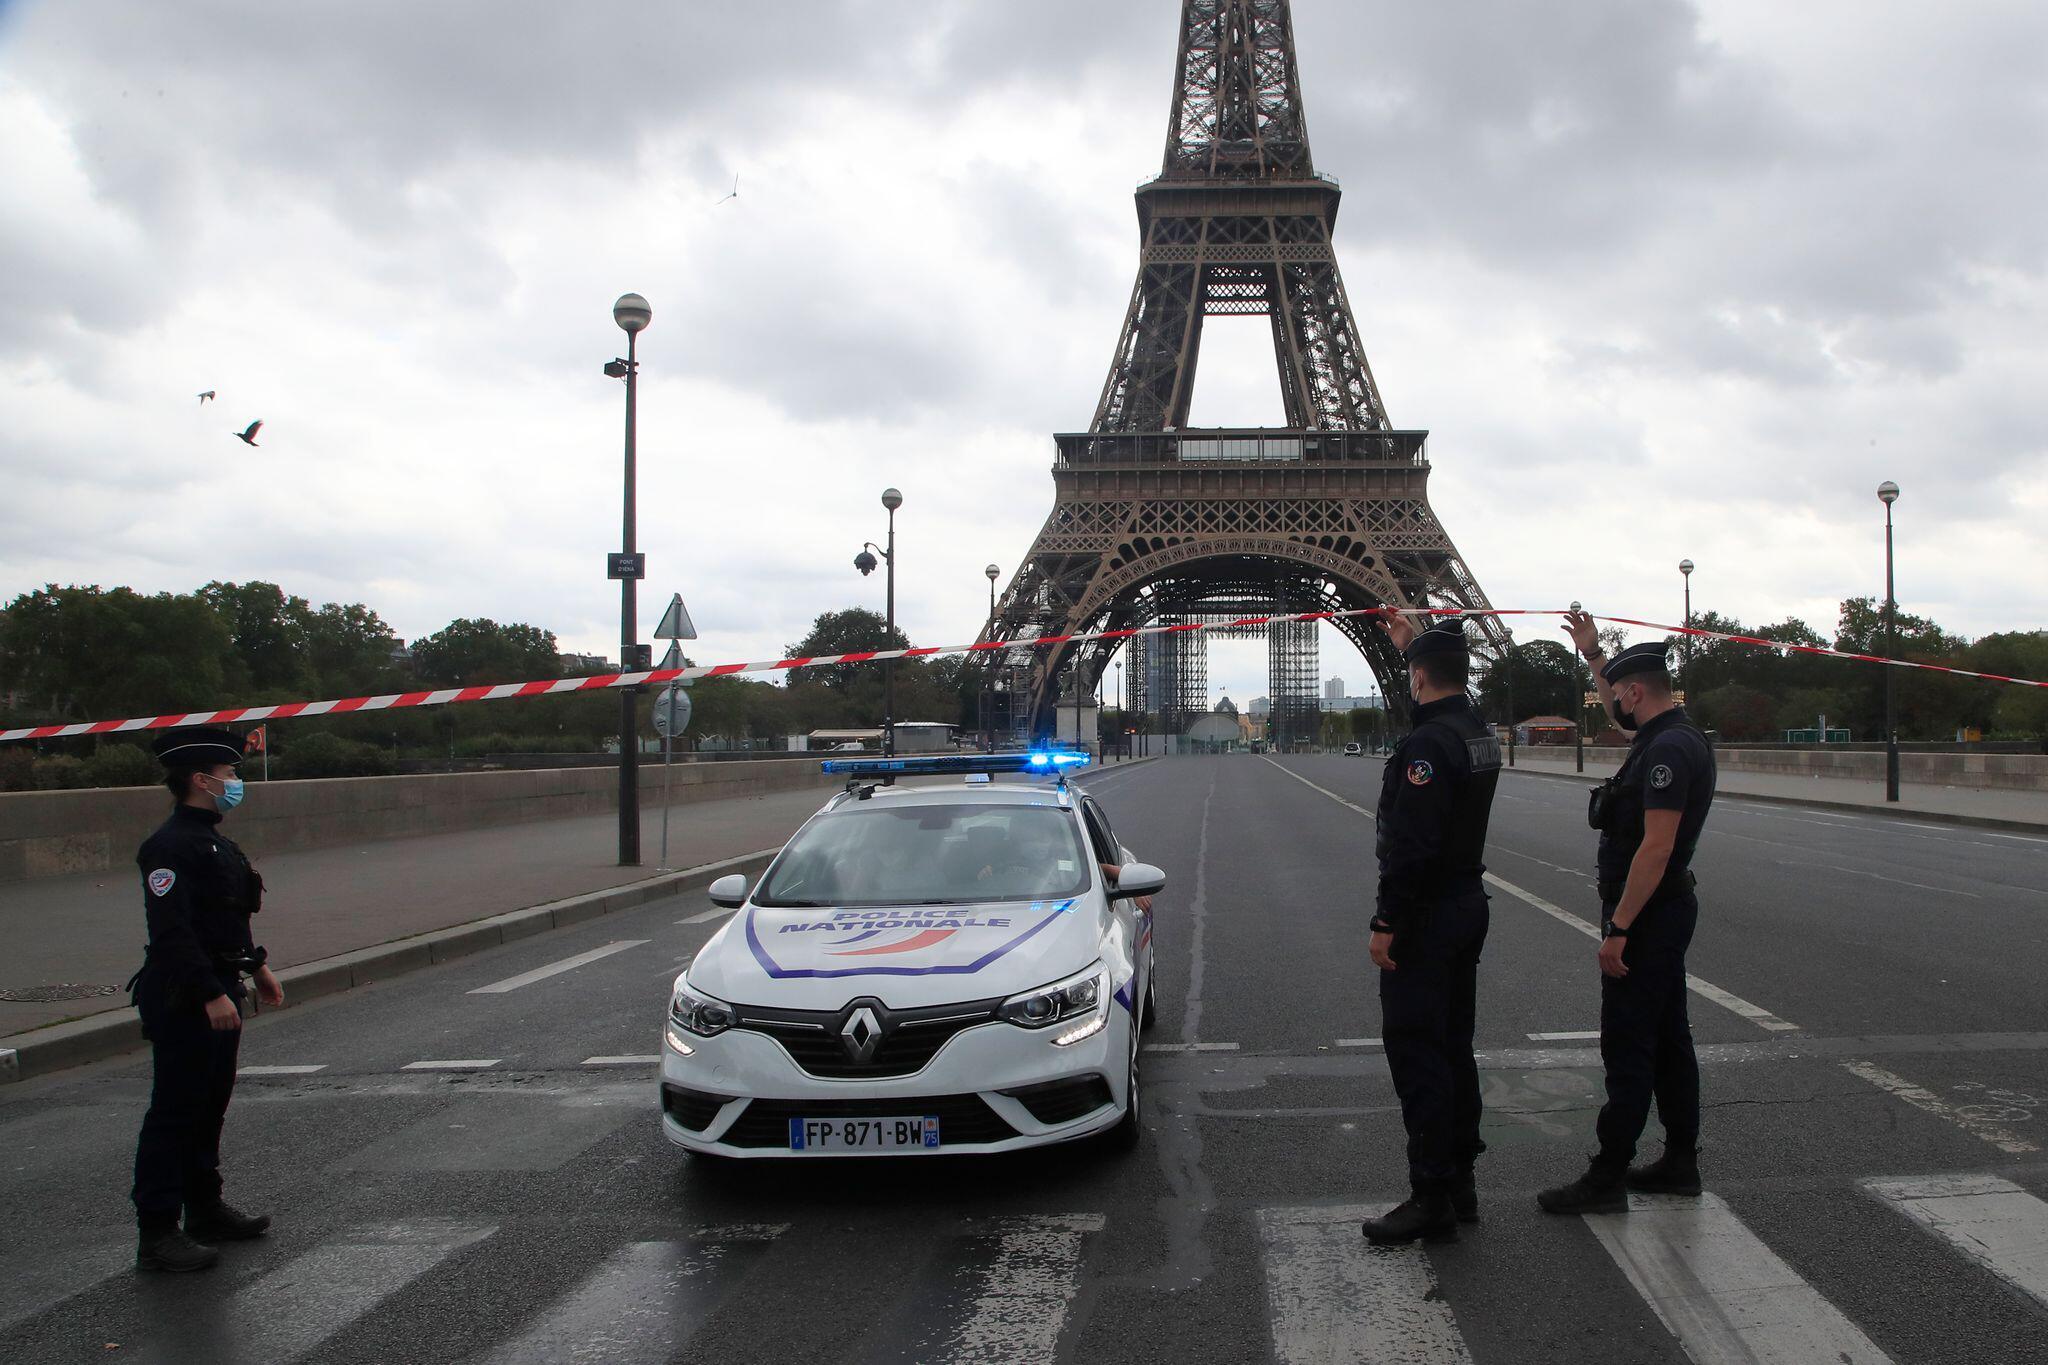 Bild zu Eiffelturm, Paris, Polizei